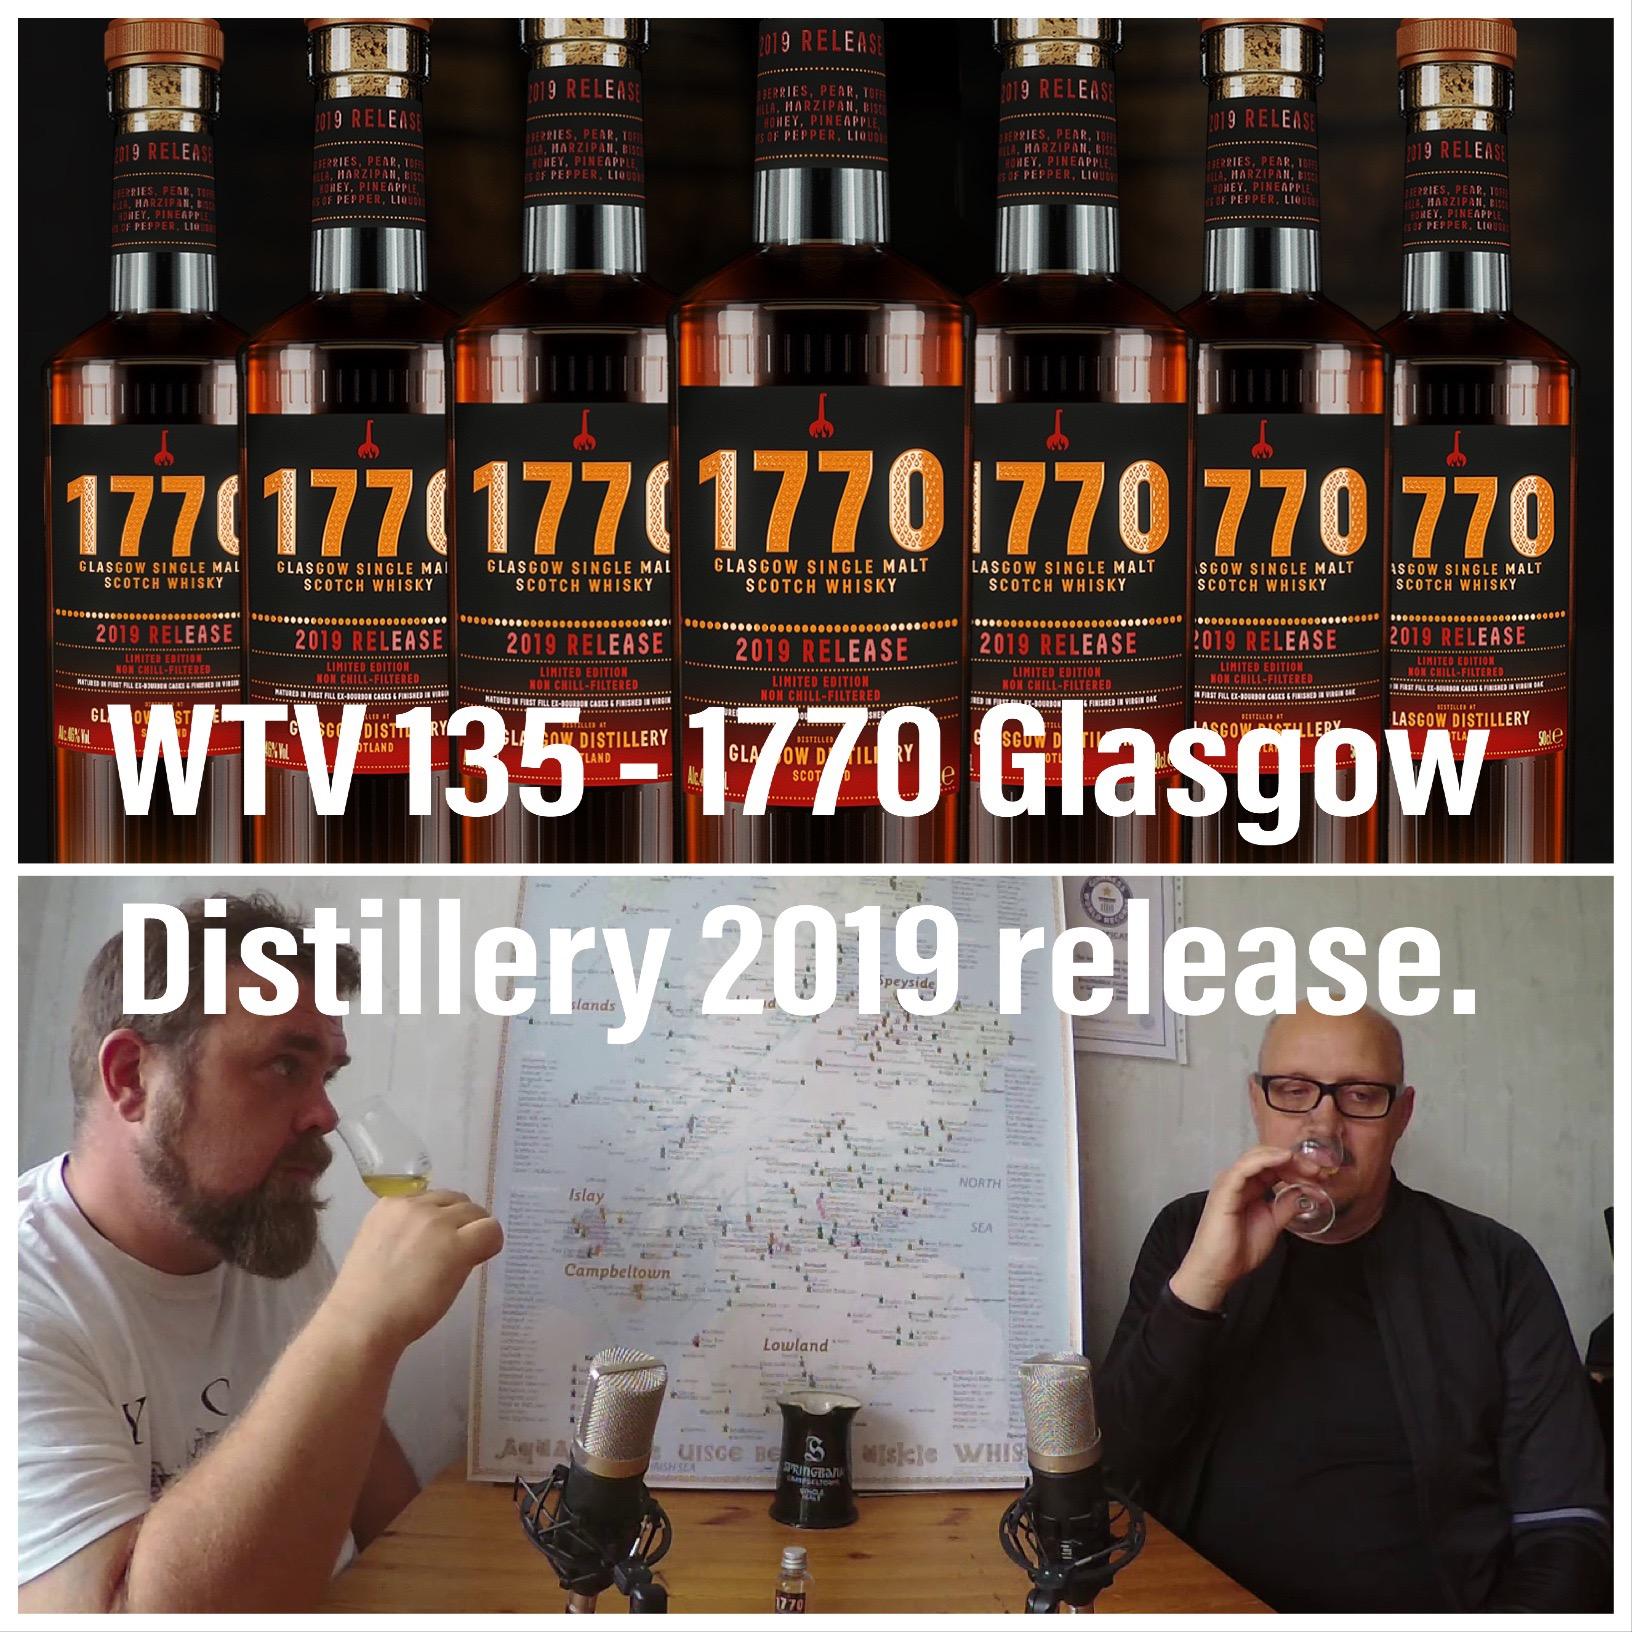 WTV 135 – 1770 Glasgow Distillery 2019 release